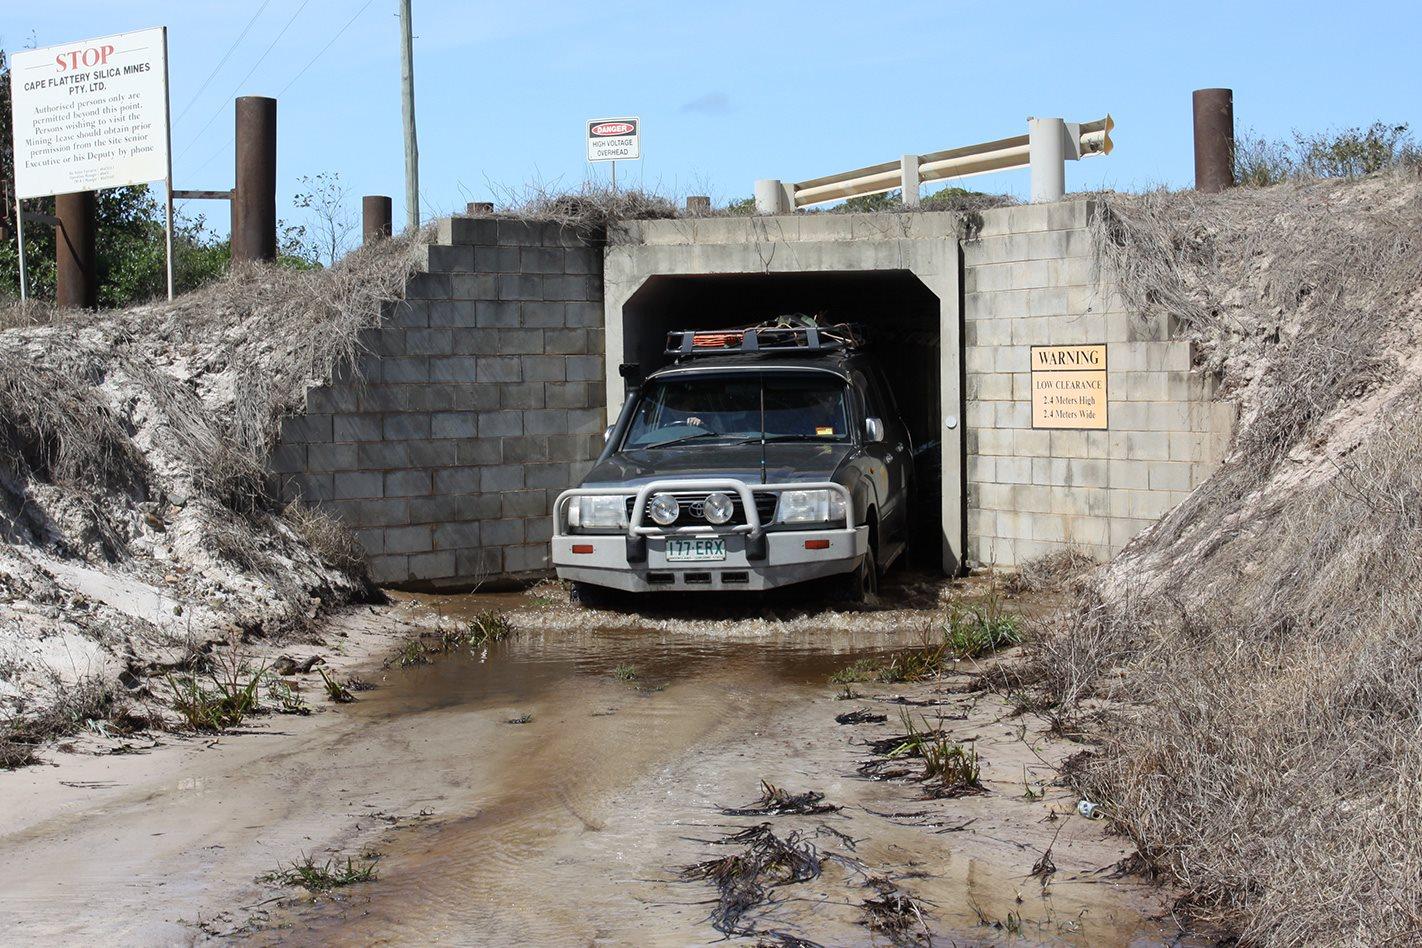 Cape Flattery Silca Mines